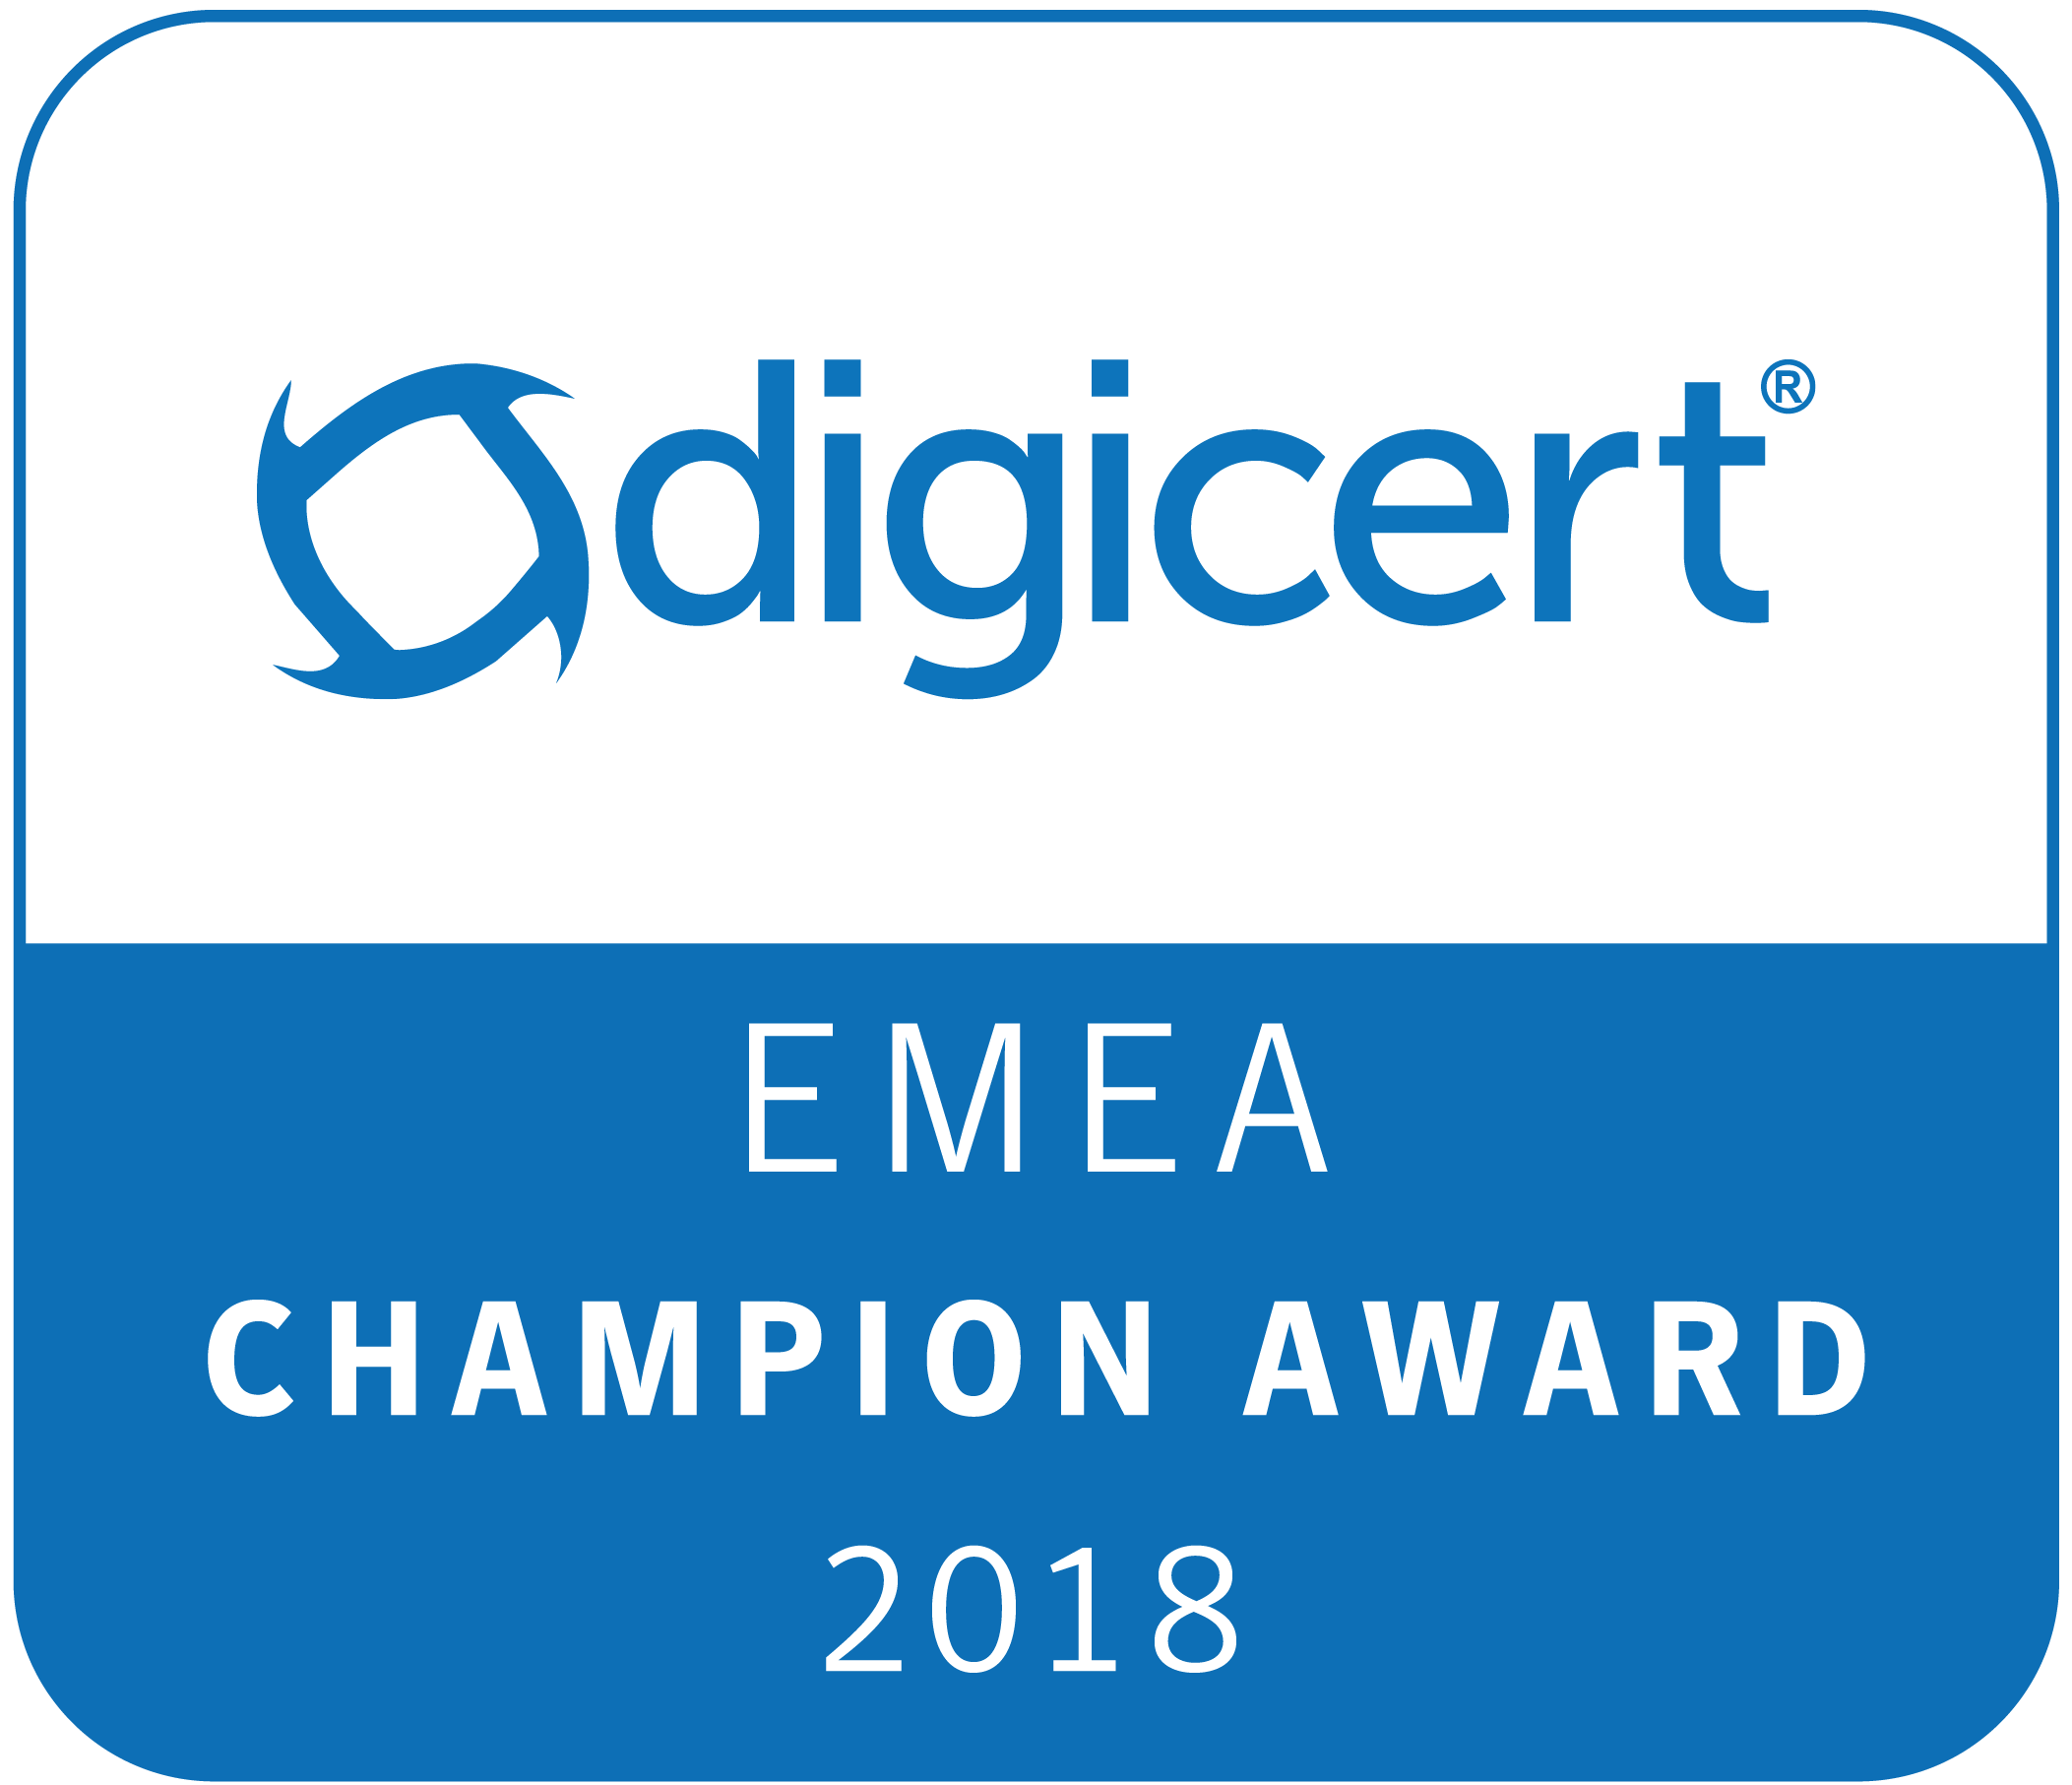 SSL247® - DigiCert EMEA Champion Award 2018